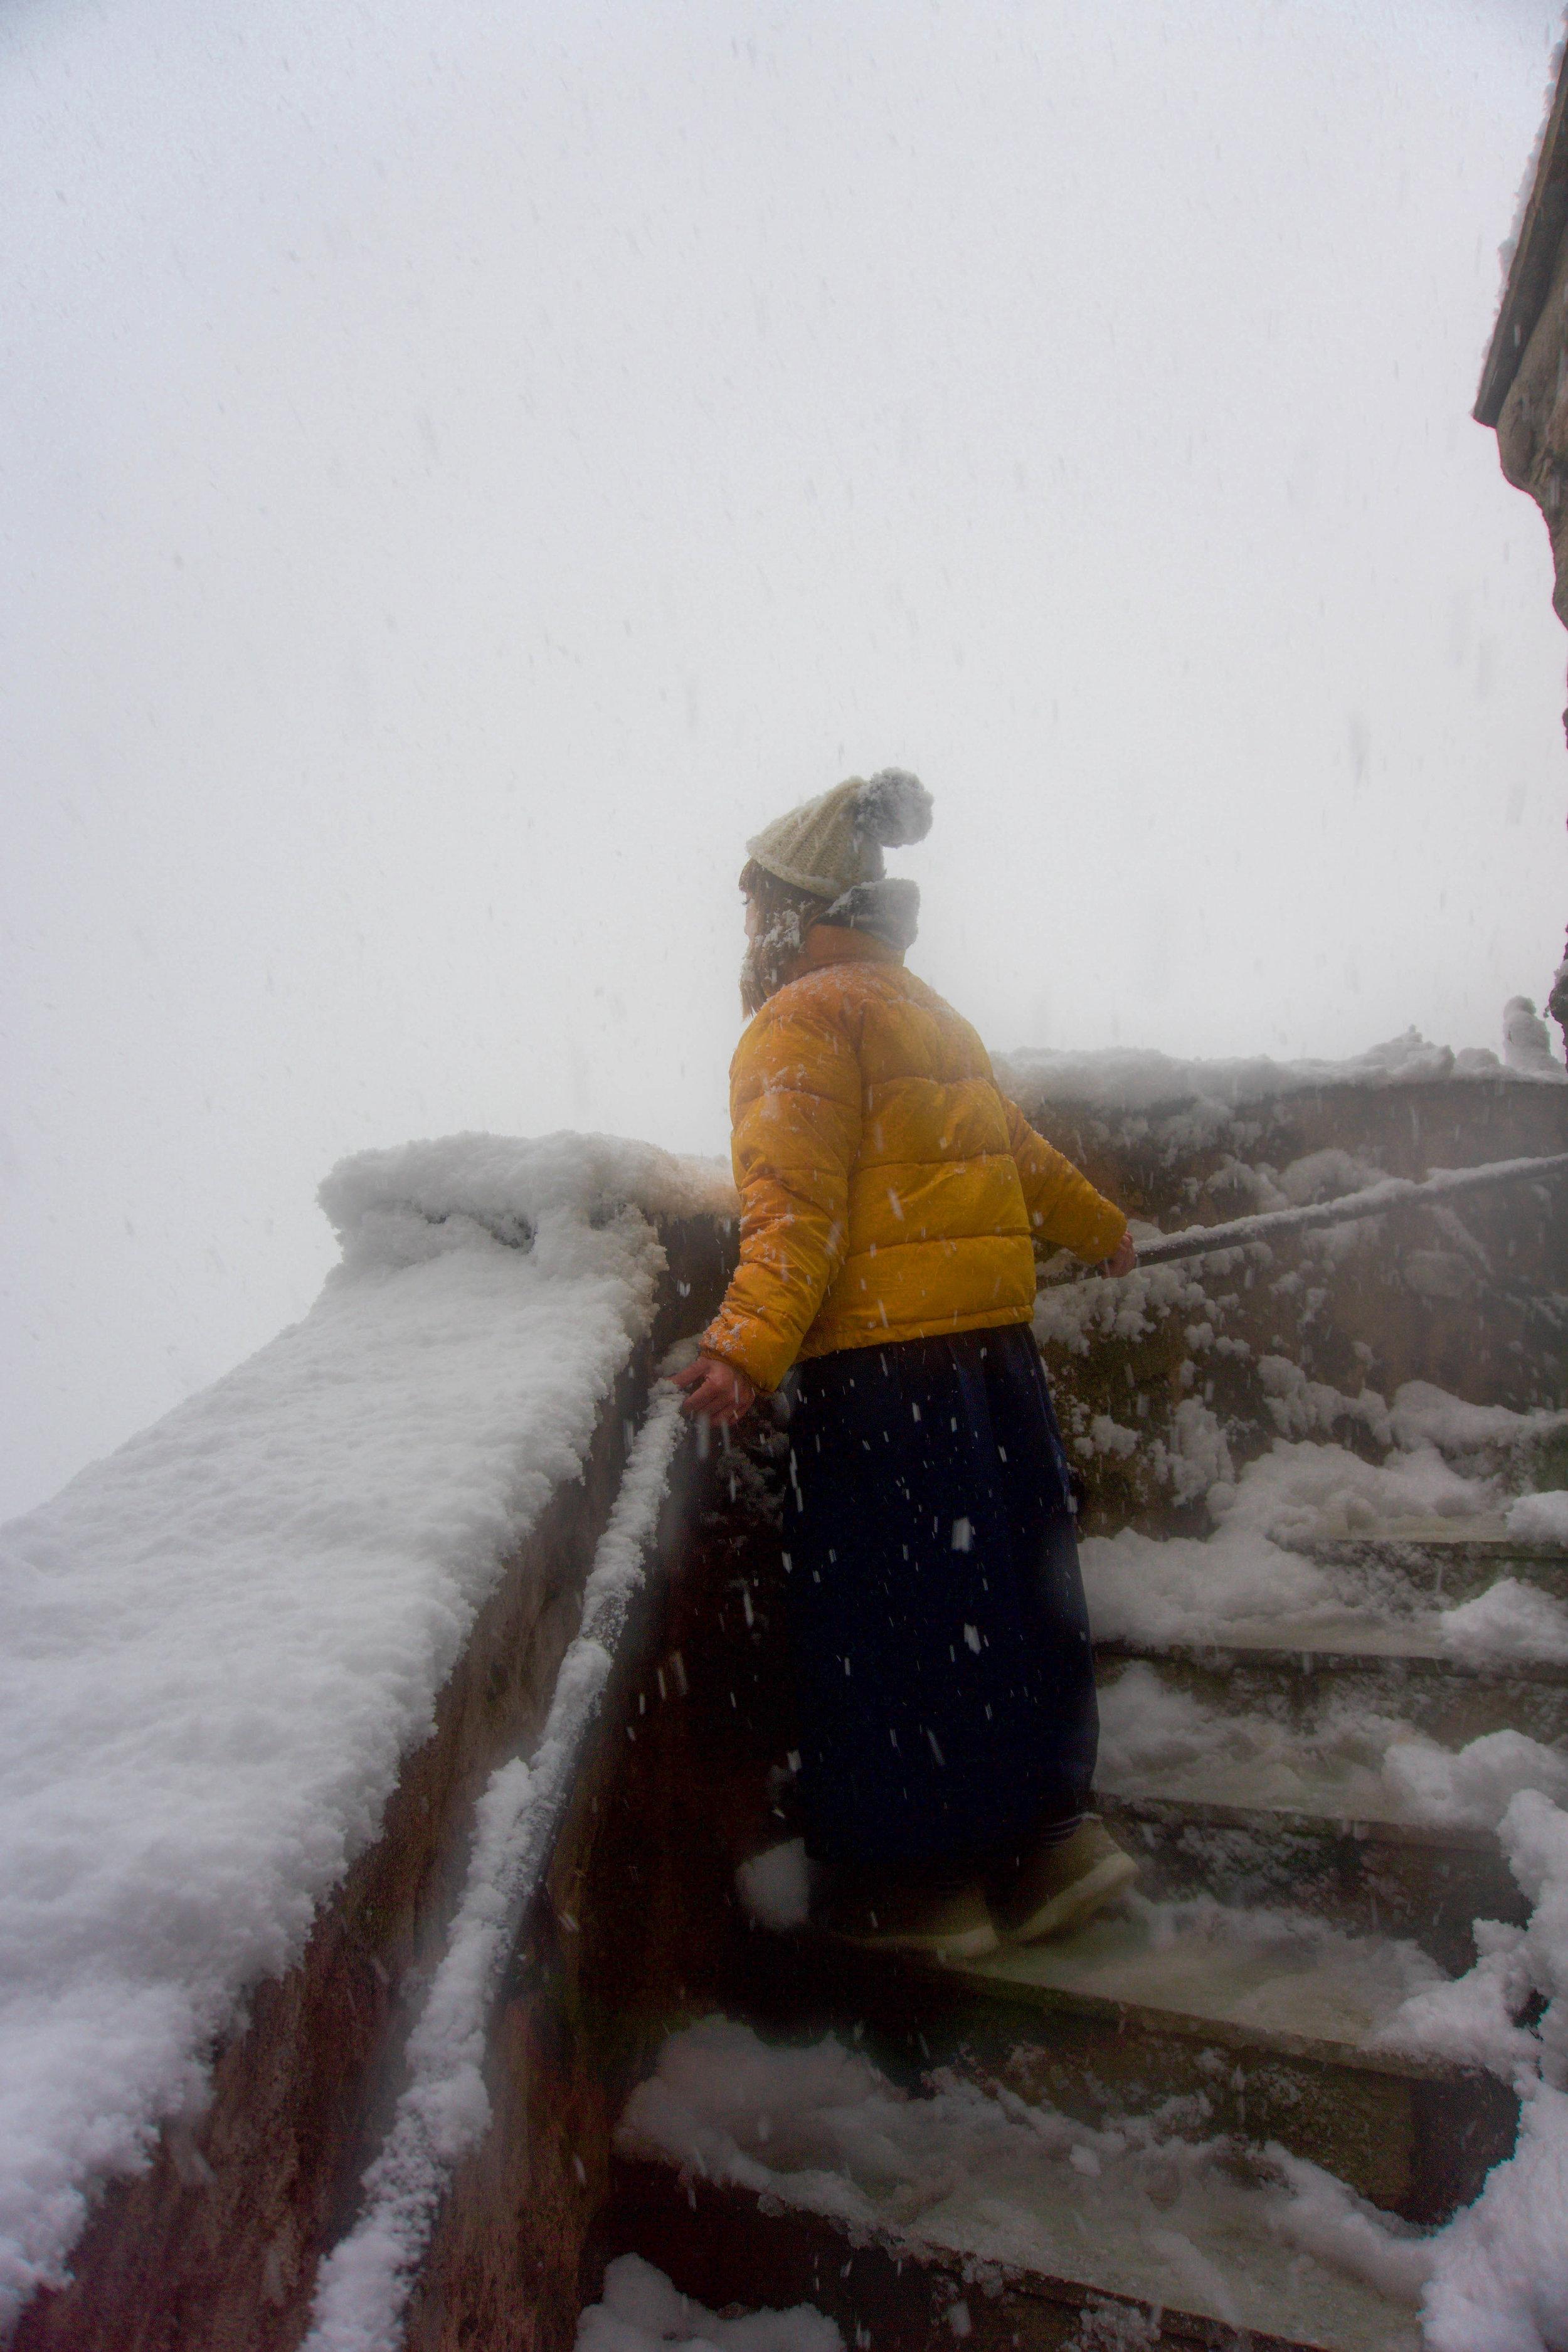 Meteora_18_Snowbunny.JPG